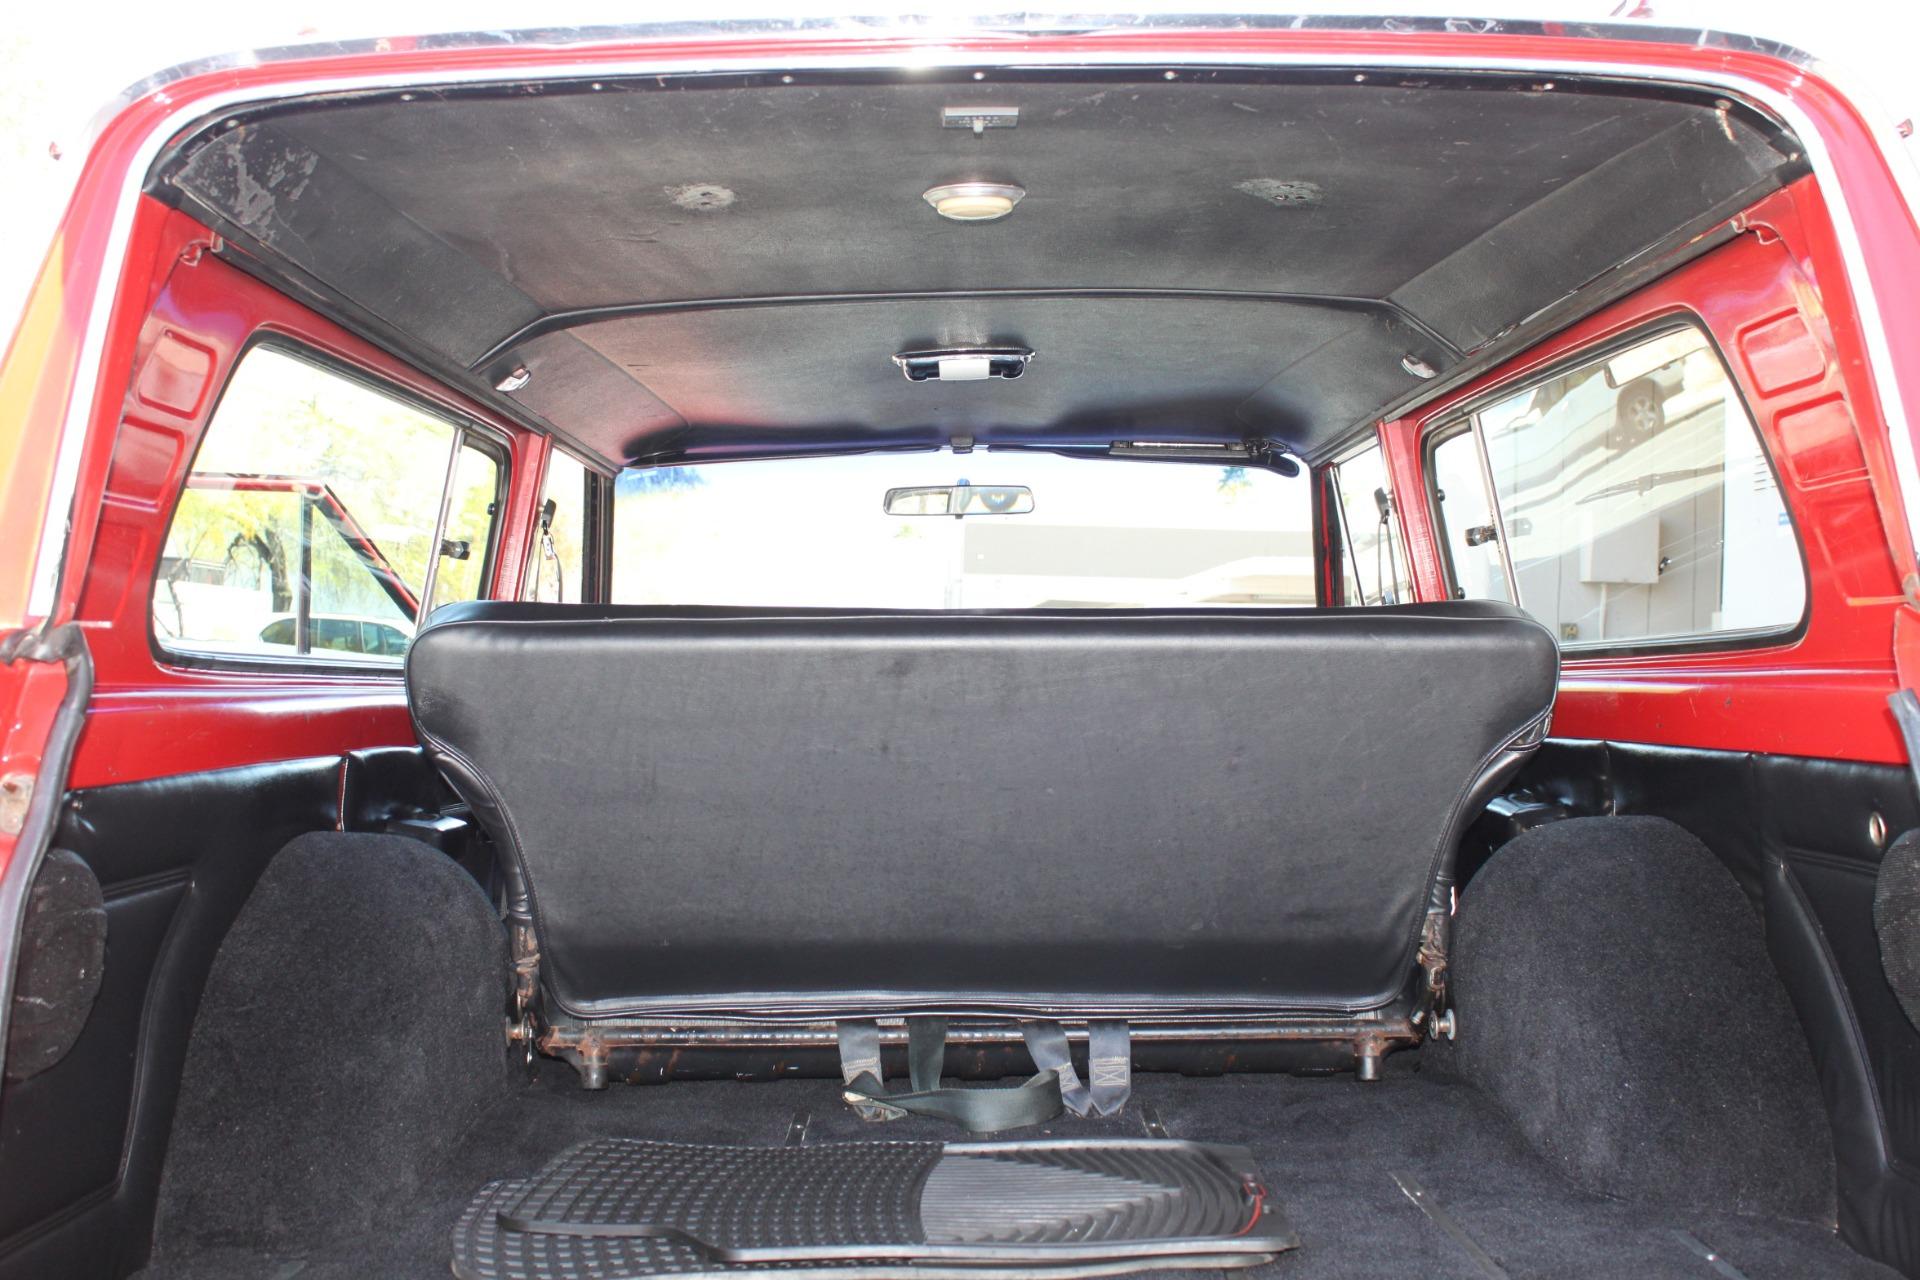 Used-1983-Jeep-Cherokee-4WD-Chief-Land-Cruiser